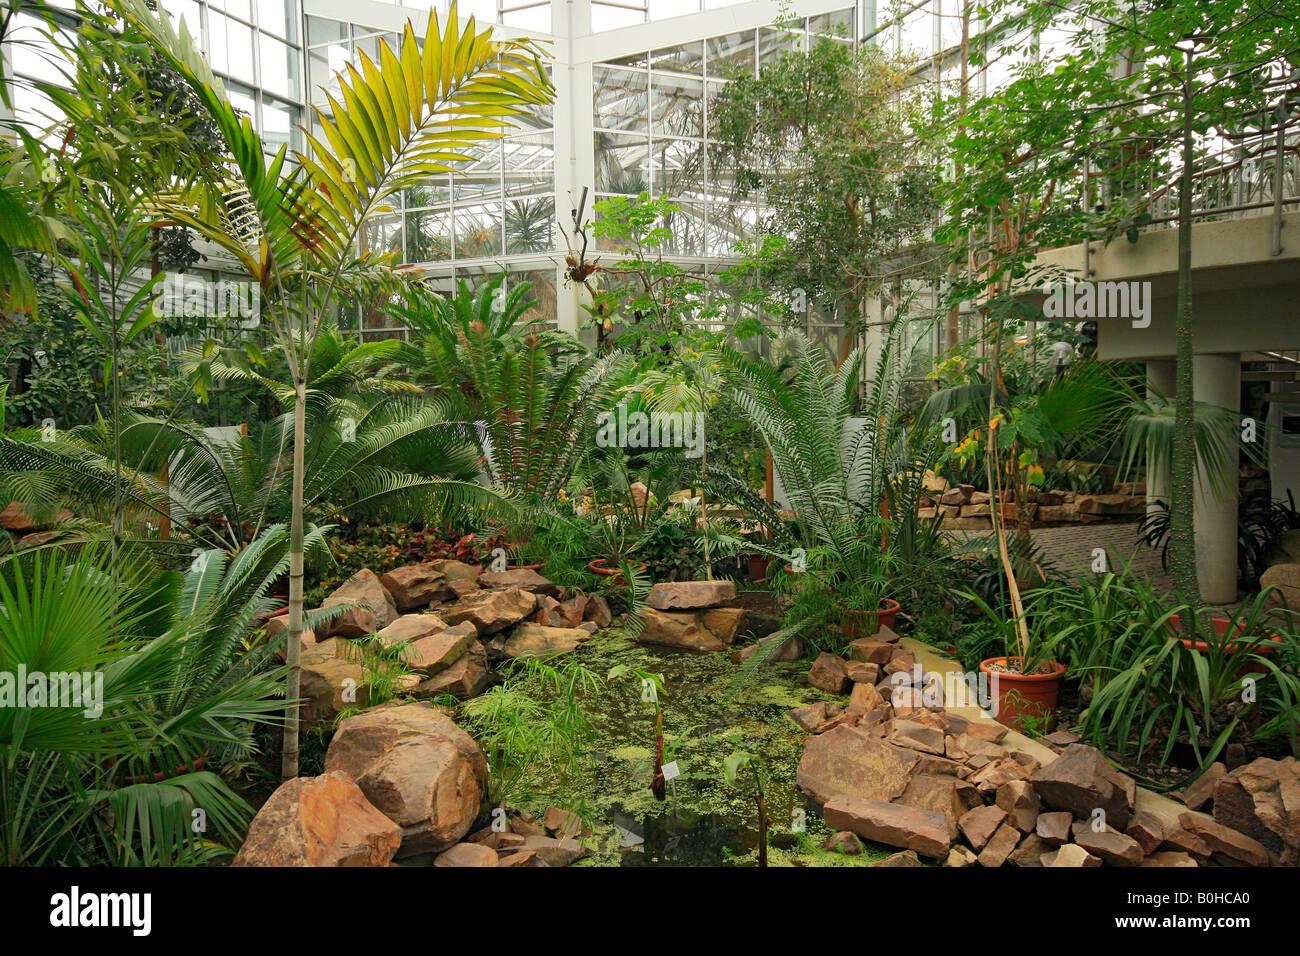 tropicarium palmengarten palm garden frankfurt am main hesse stock photo royalty free image. Black Bedroom Furniture Sets. Home Design Ideas